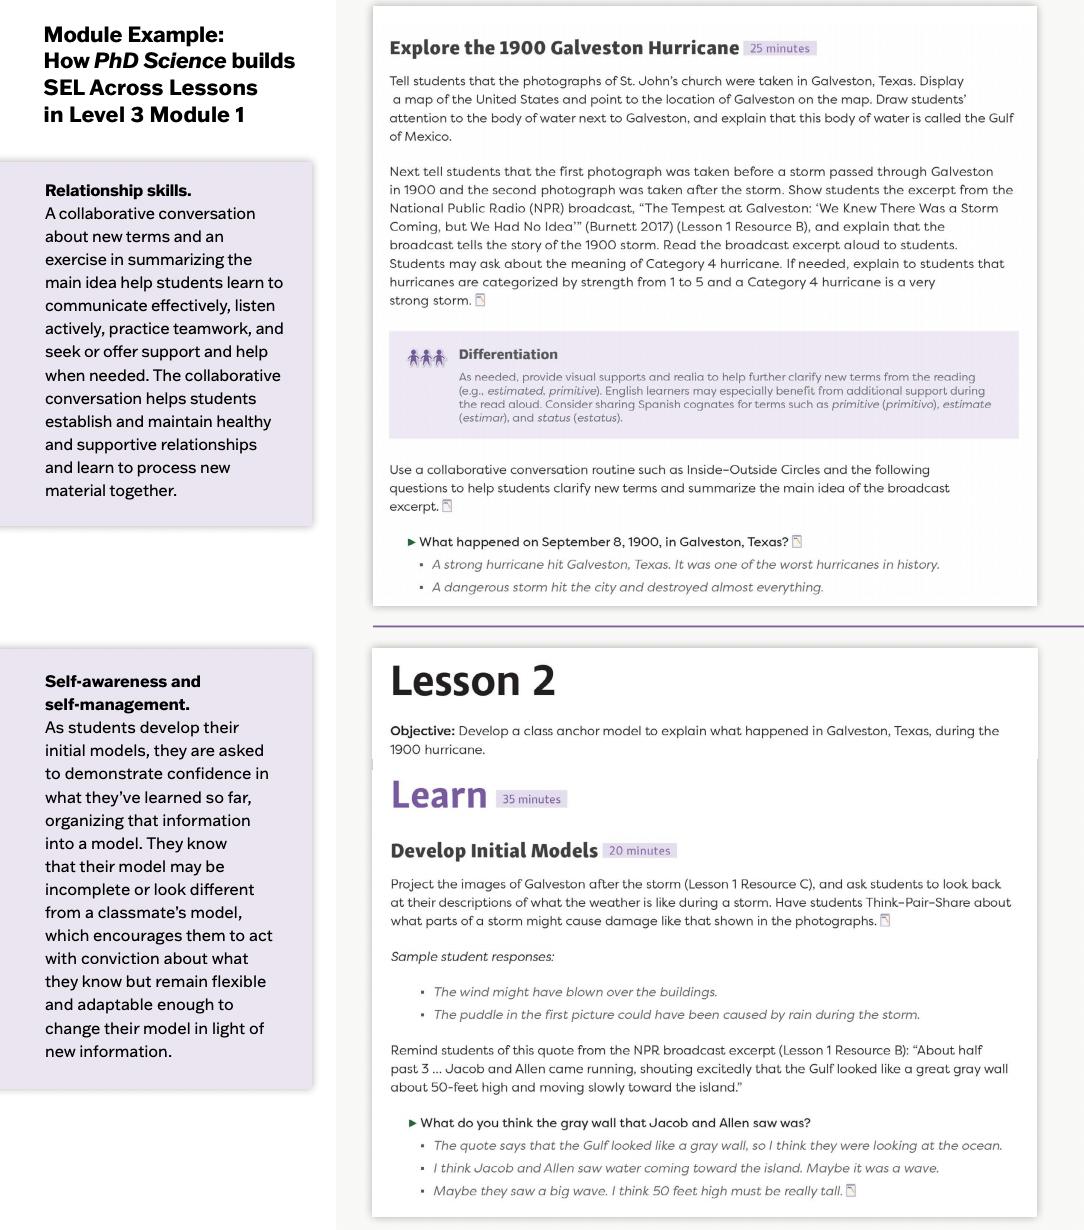 PhDScience_SEL_Lesson1.1